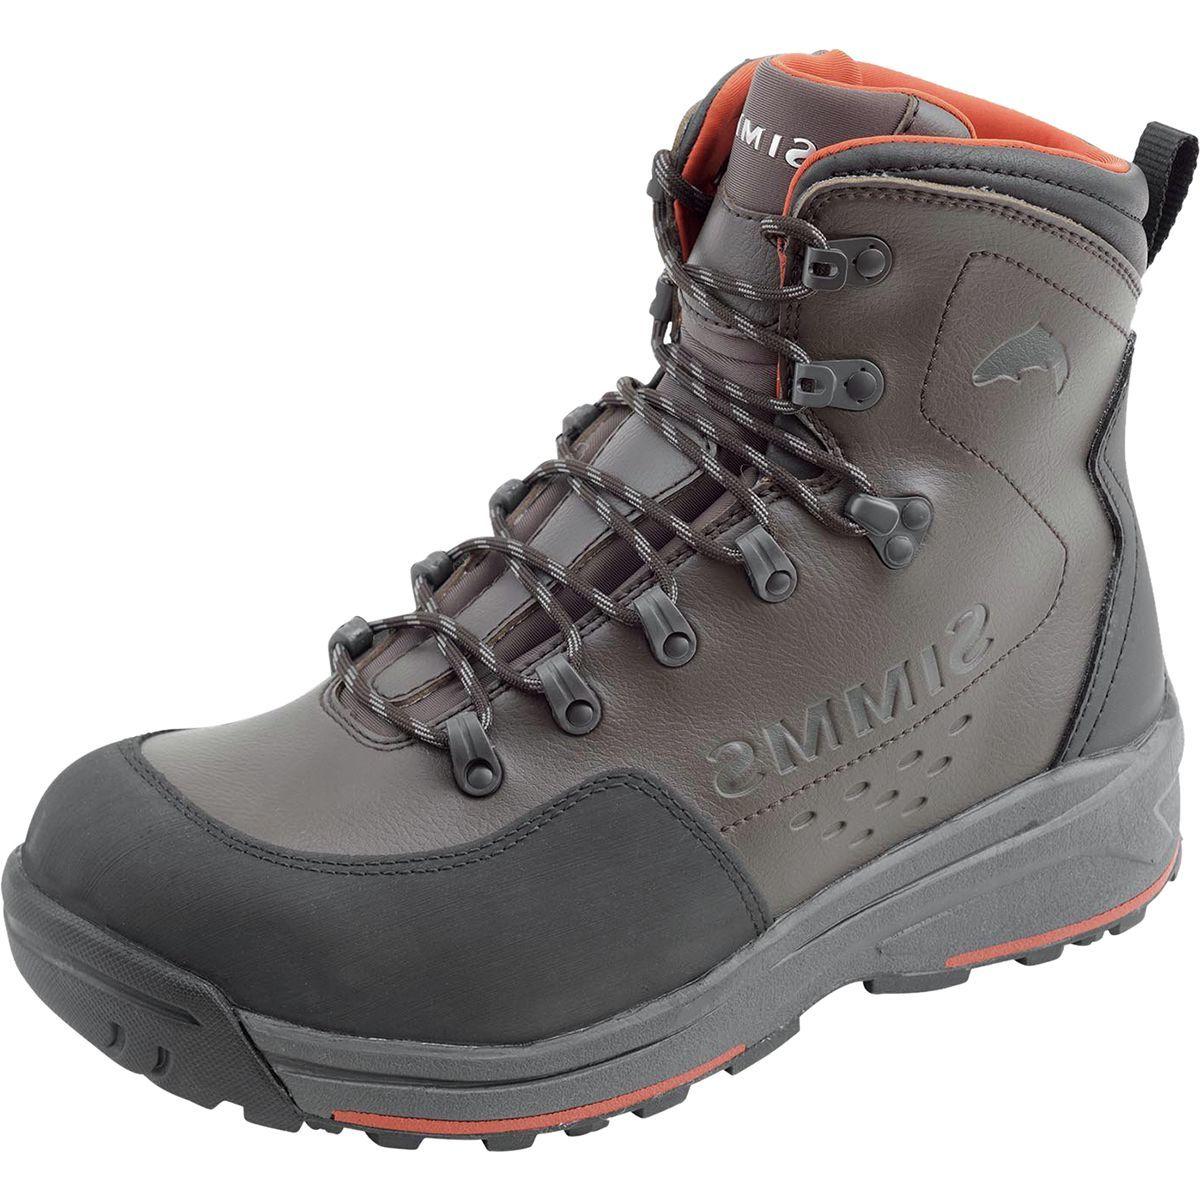 Simms Freestone Boot - Men's